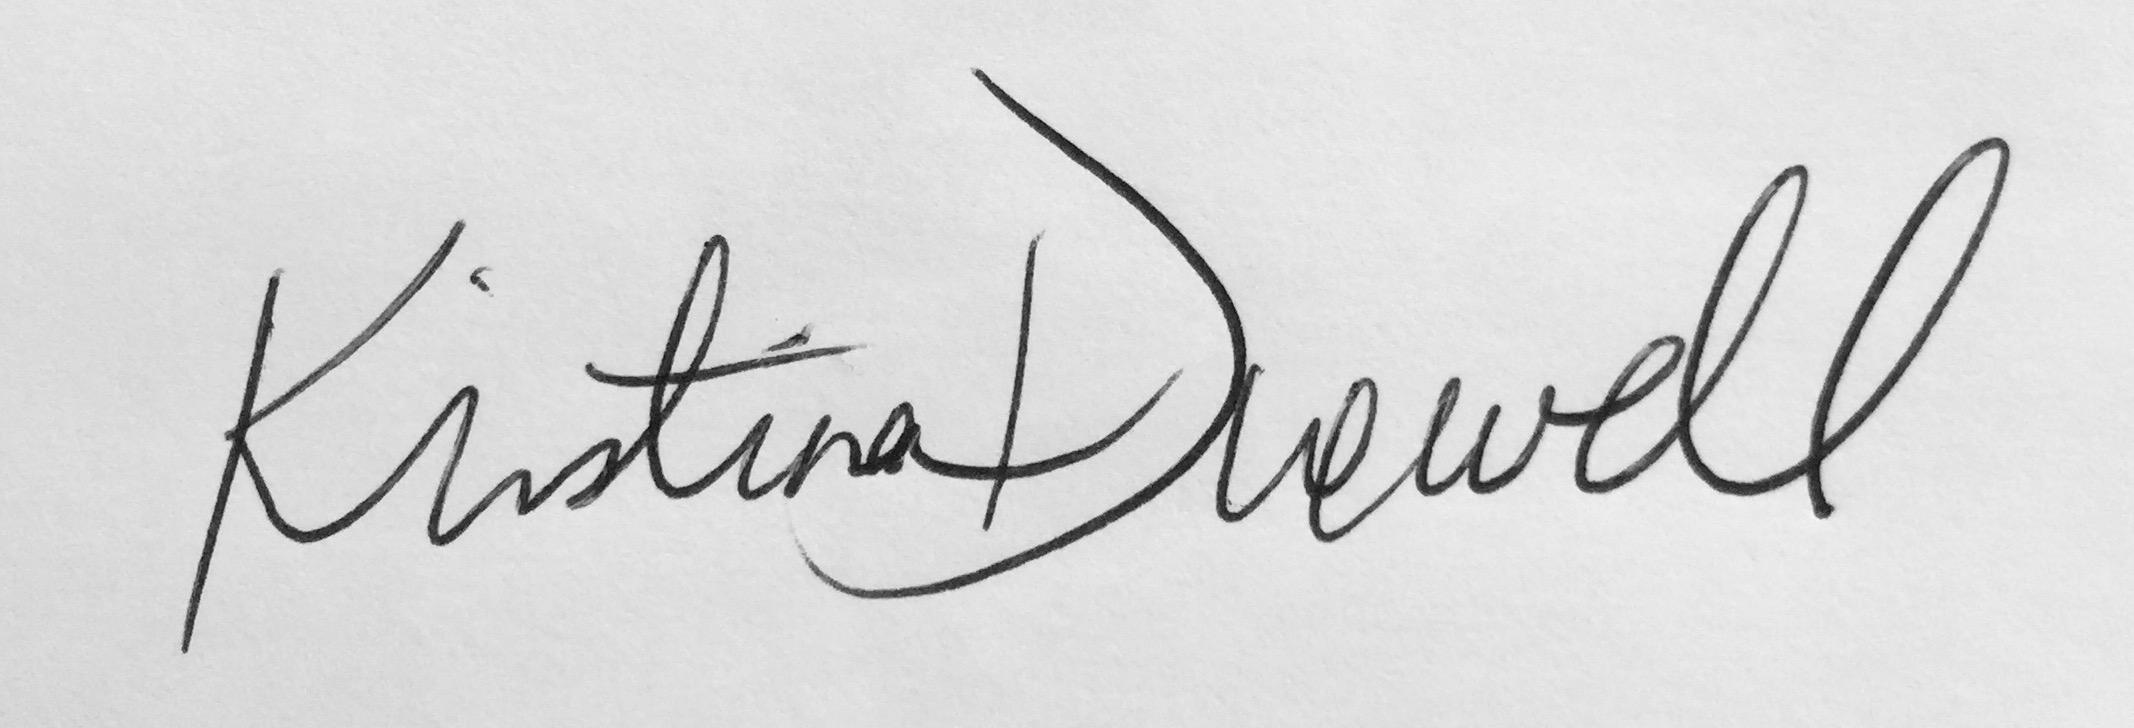 Kristina Duewell's Signature